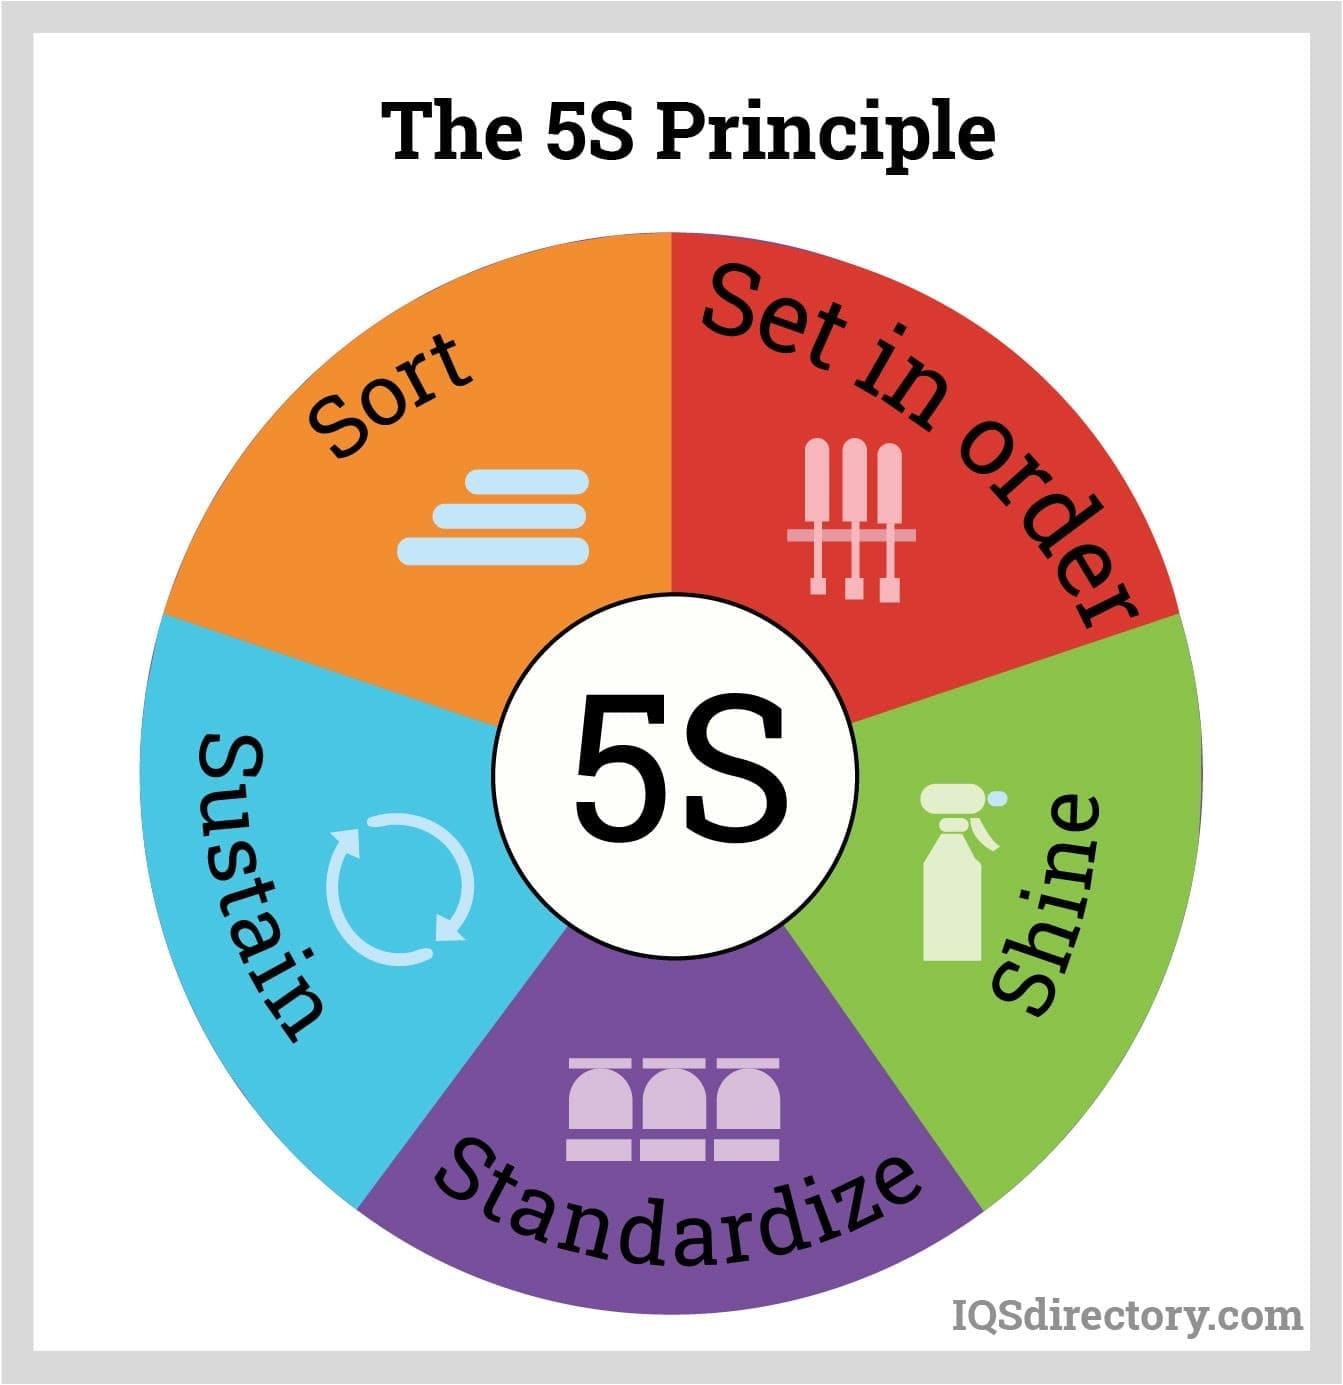 The 5S Principle